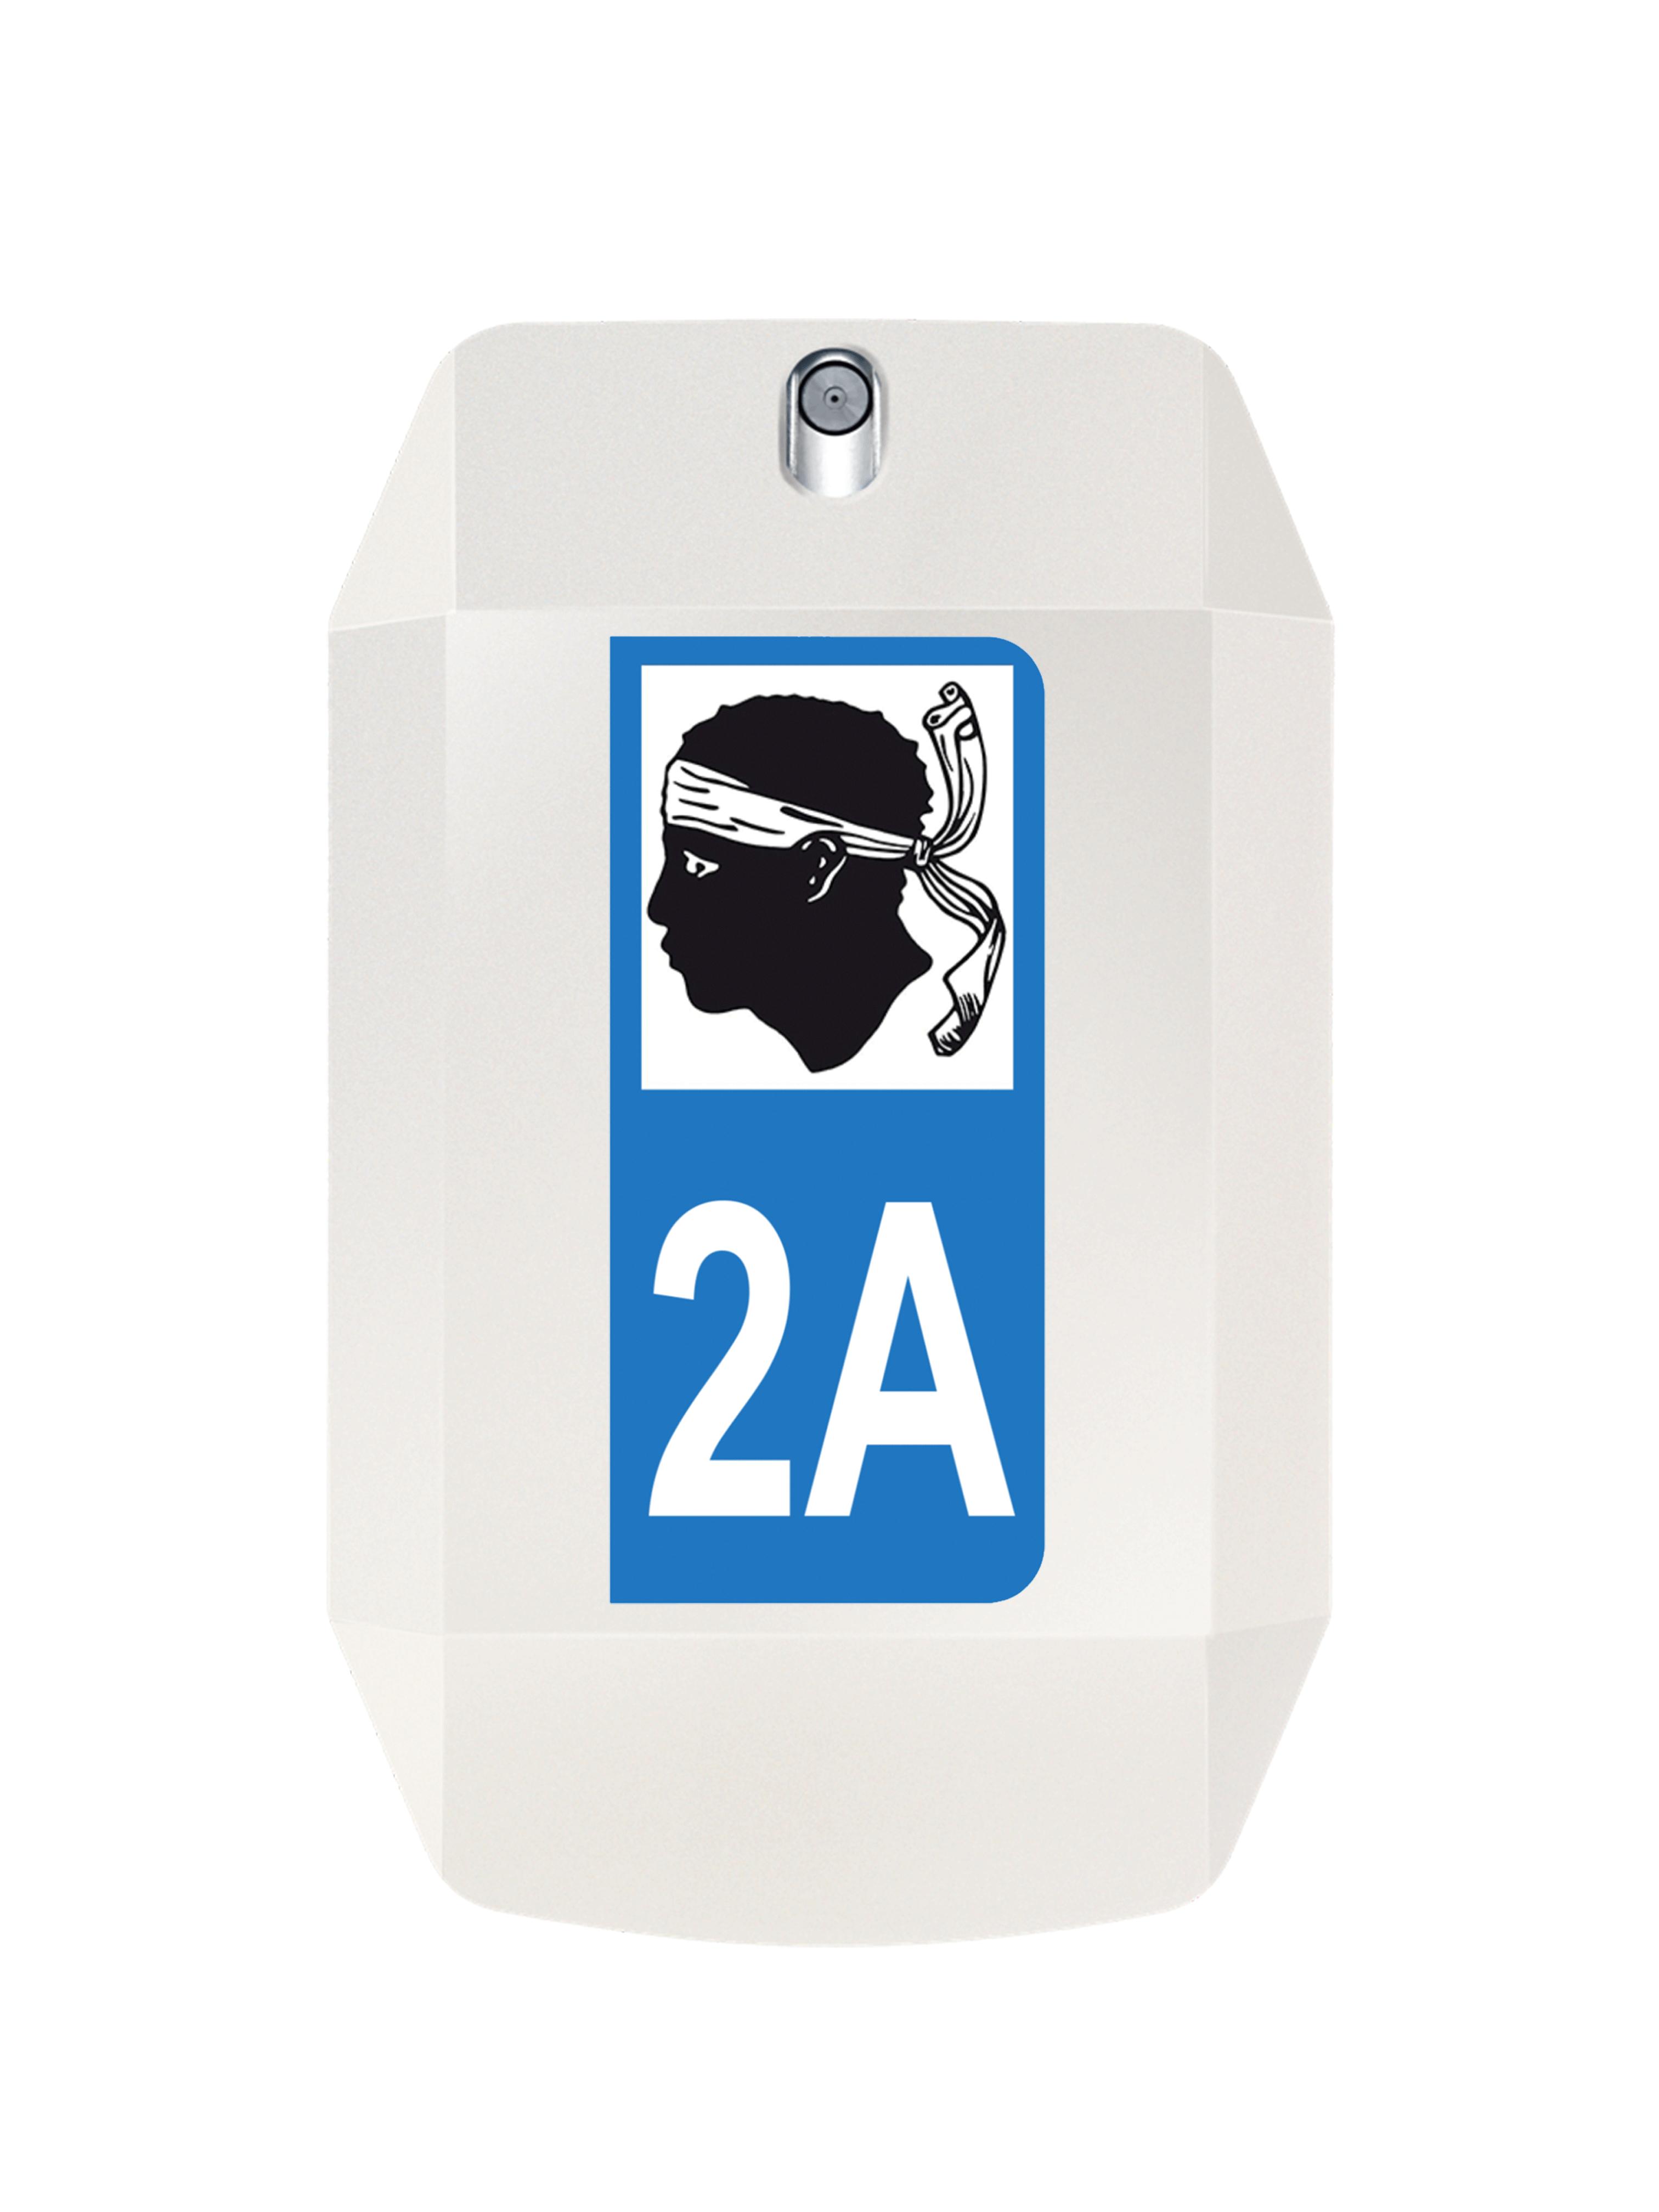 Kutjo 2A – Spray Nettoyant Ecran 15ml